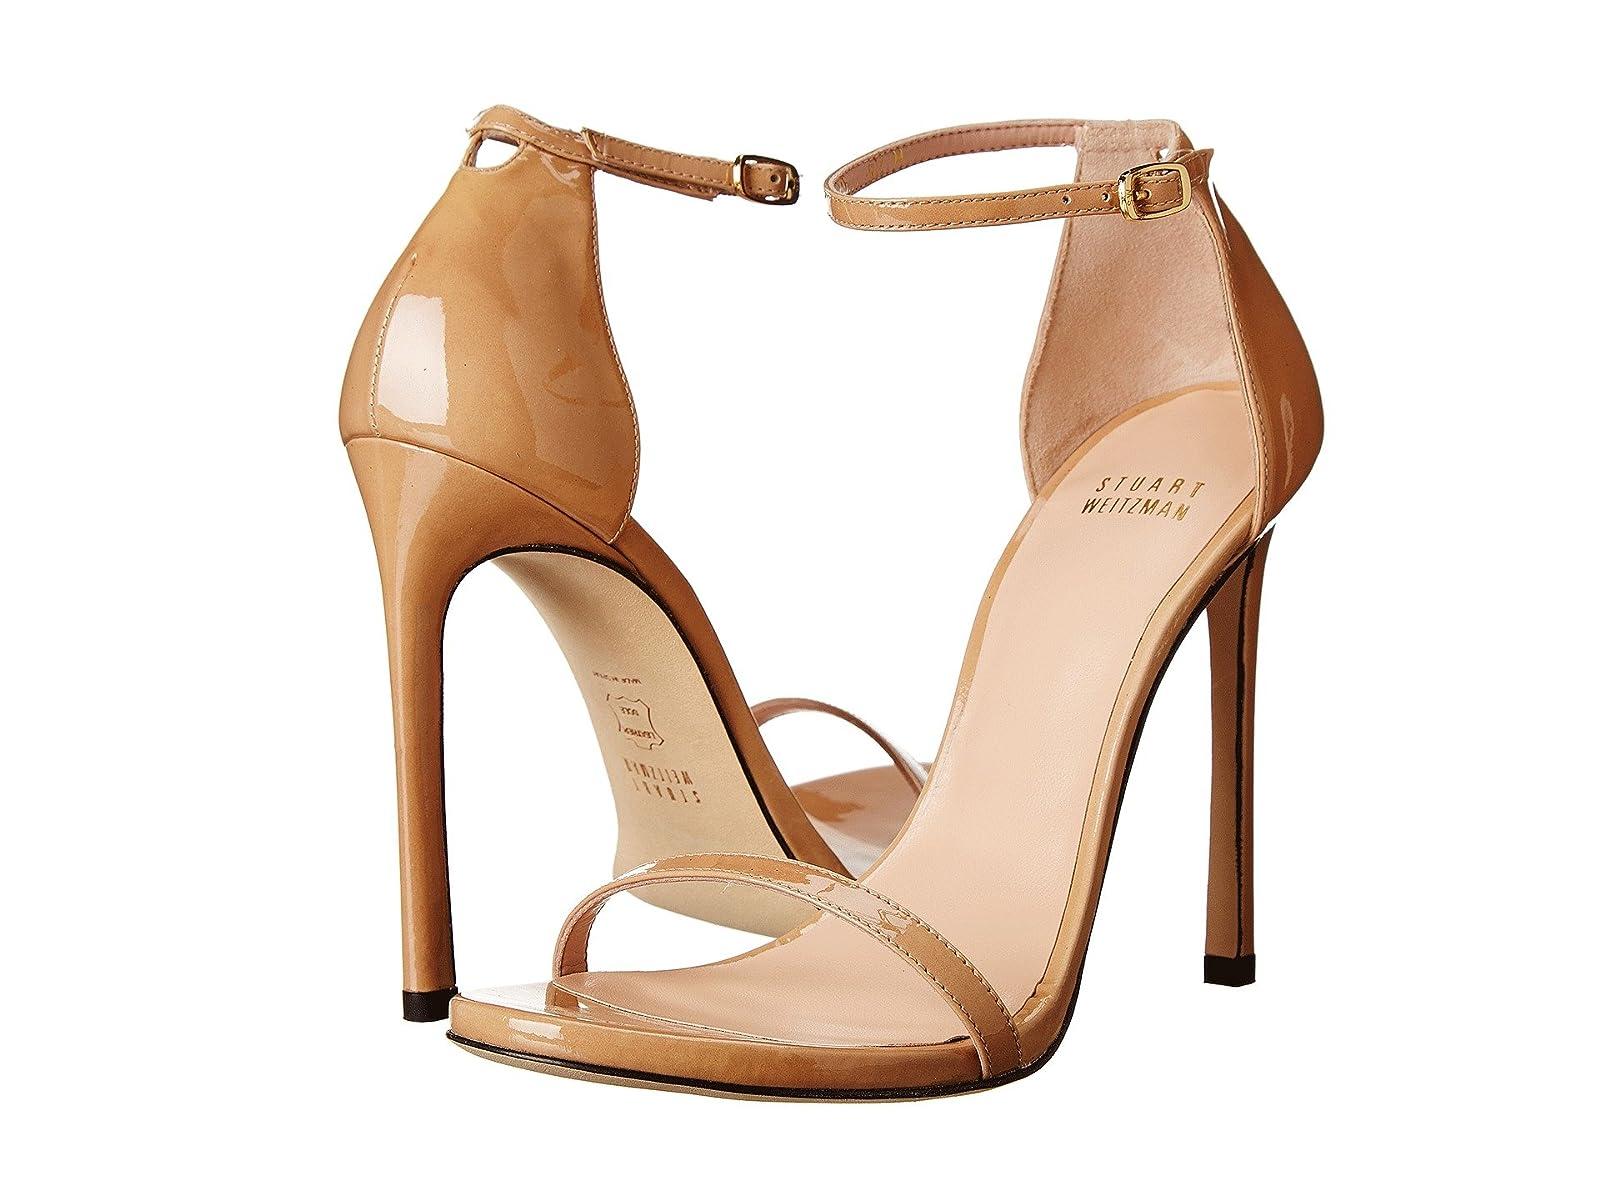 Stuart Weitzman NudistAtmospheric grades have affordable shoes